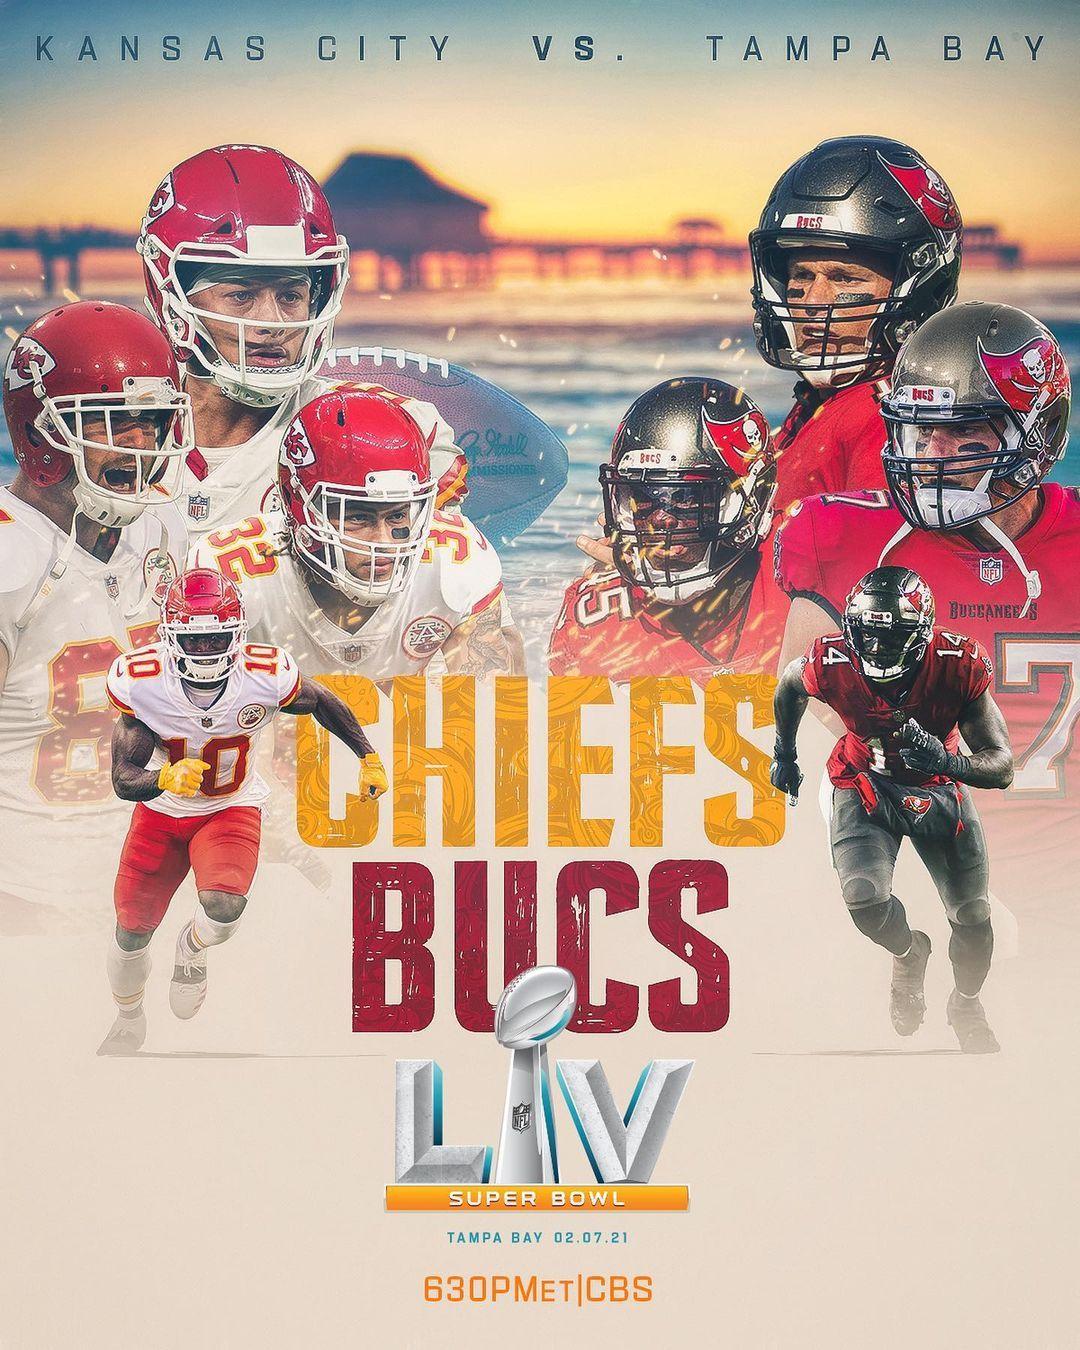 Nfl On Instagram Chiefs Buccaneers Super Bowl Lv Is Set Sblv In 2021 Super Bowl Buccaneers Football Nfl Season